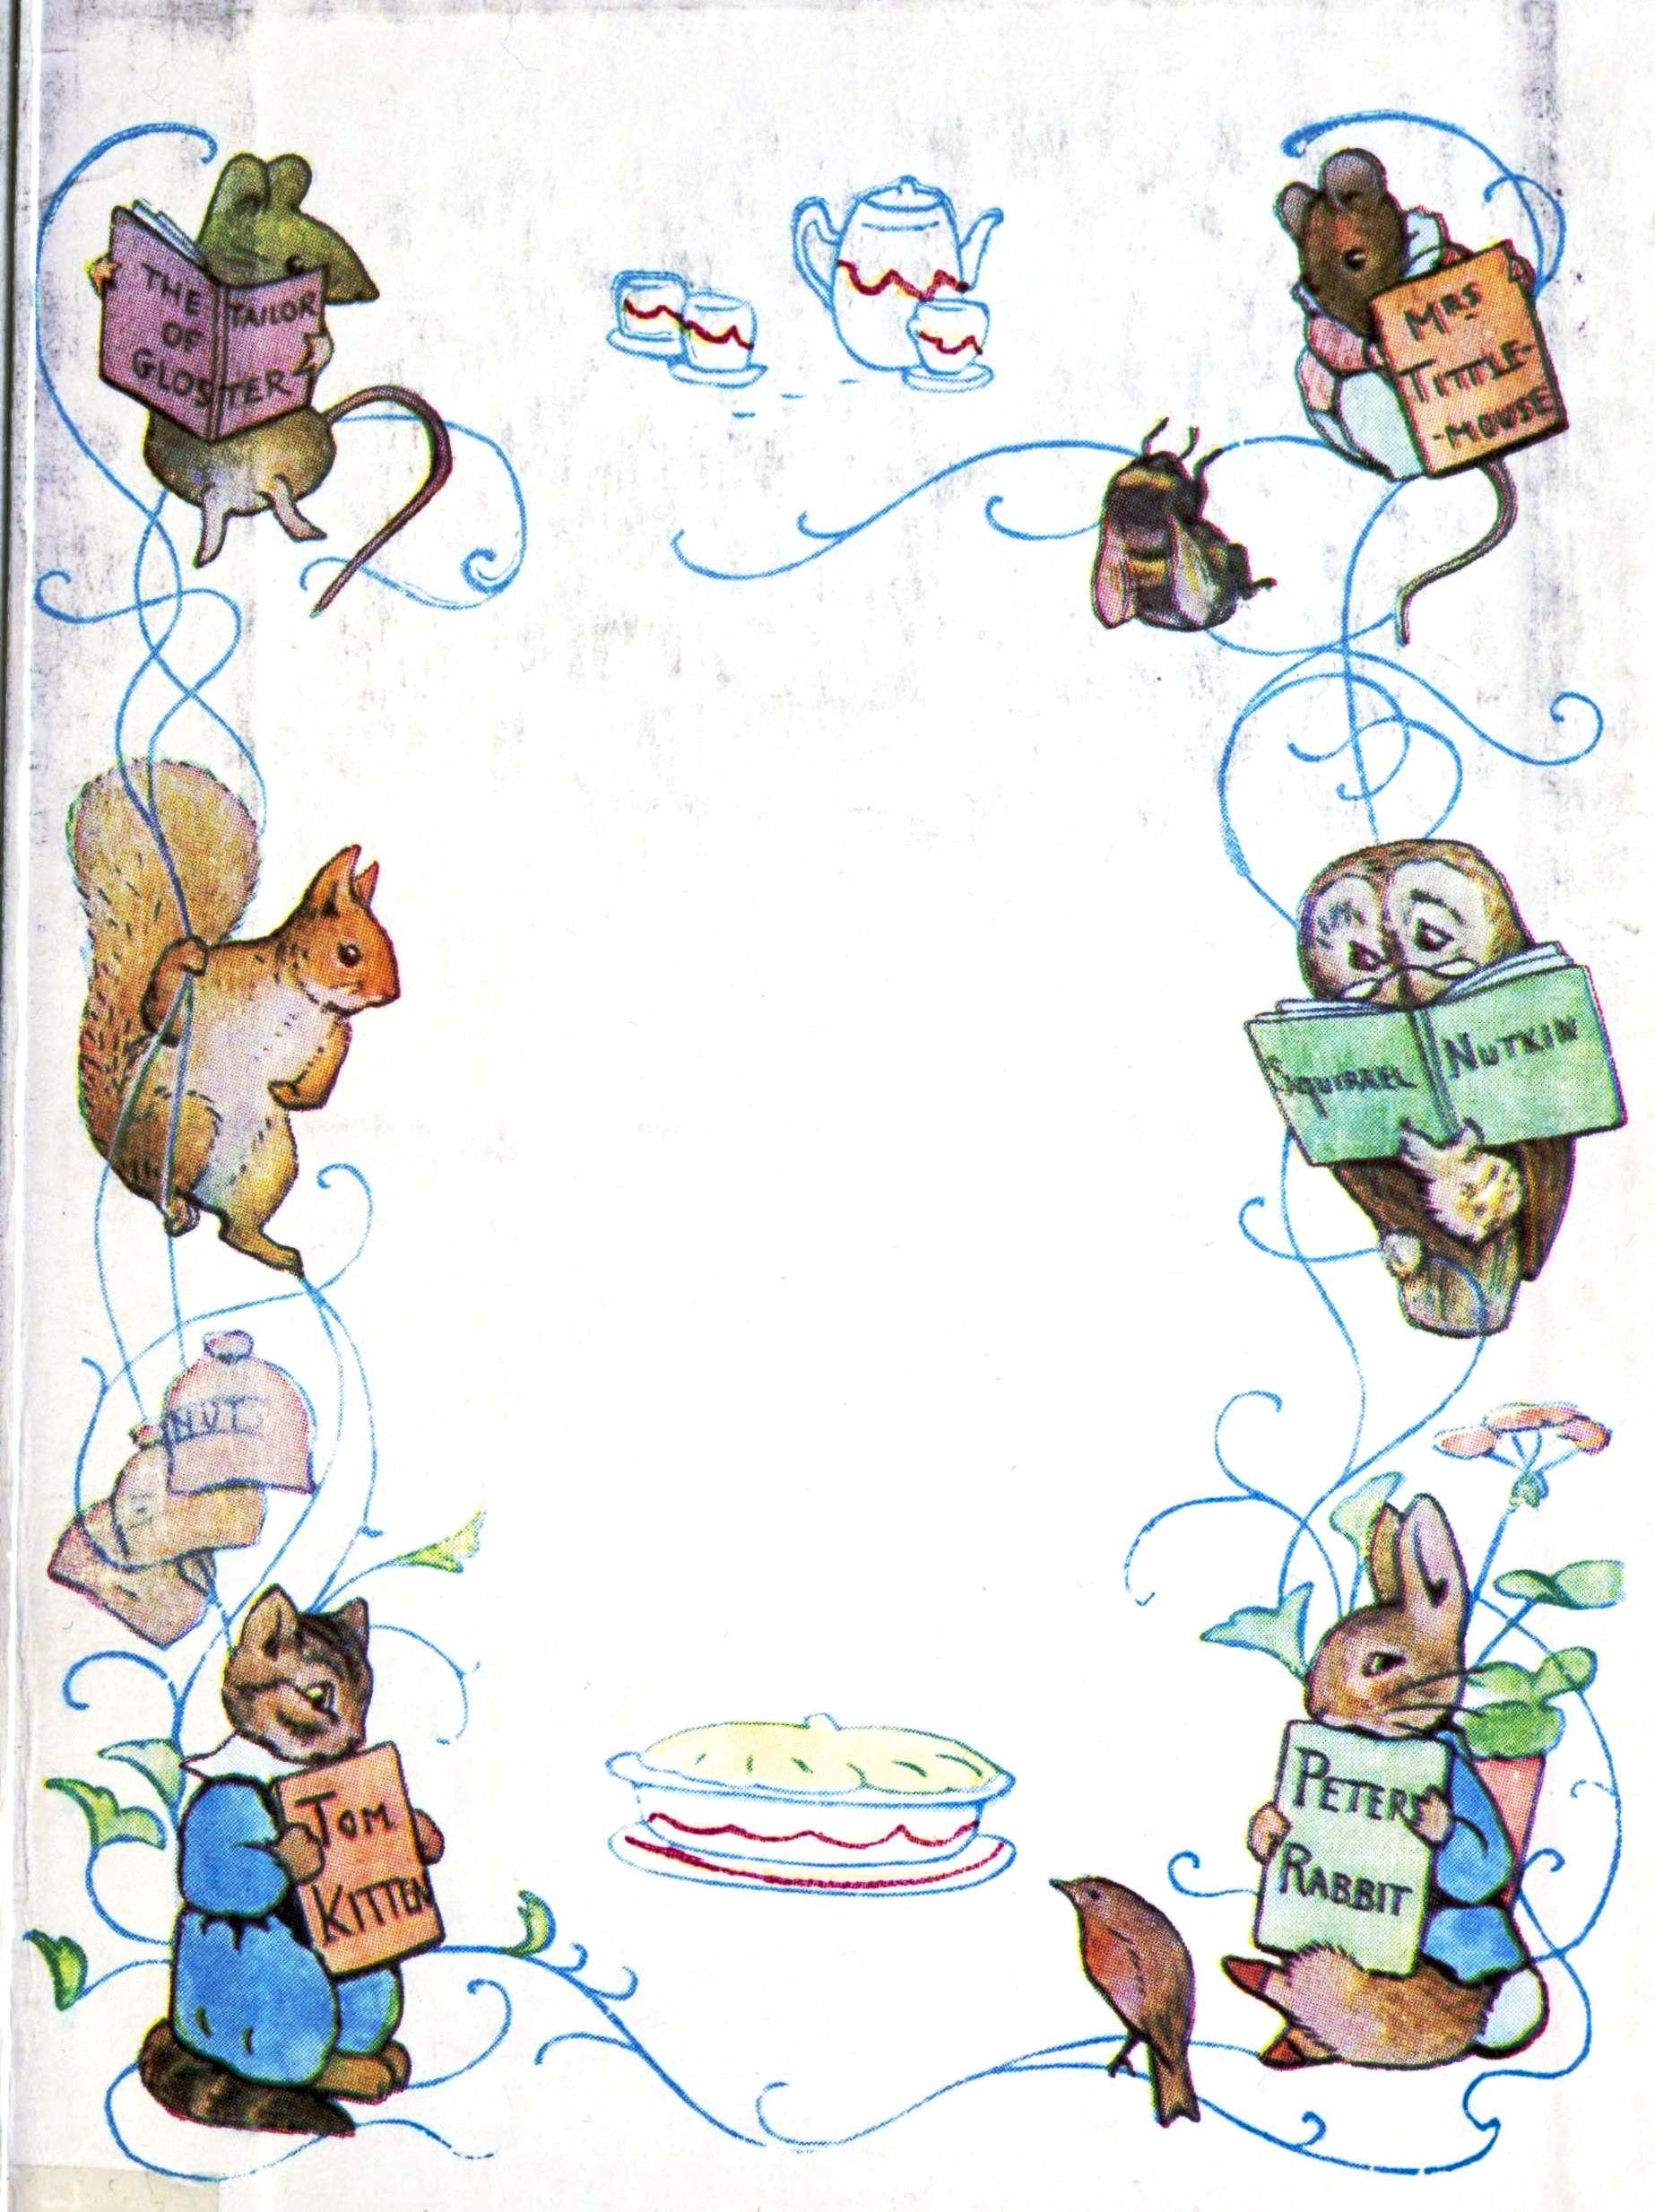 Juvenile beatrix potter page border tom kitten - Peter rabbit nursery border ...